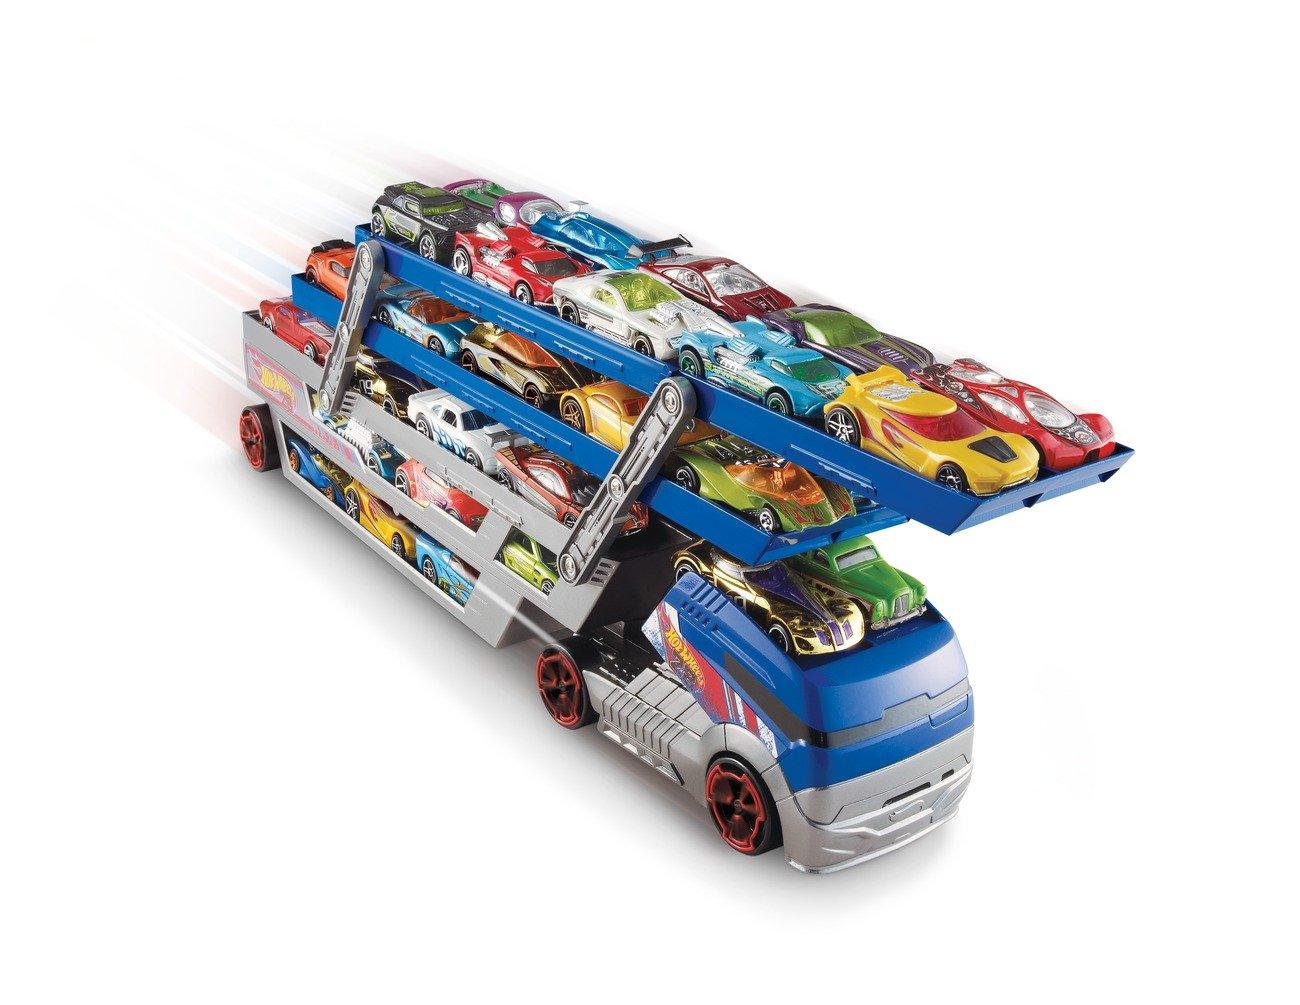 Hot Wheels Toy Car Holder Case : Hot wheels display case car scale